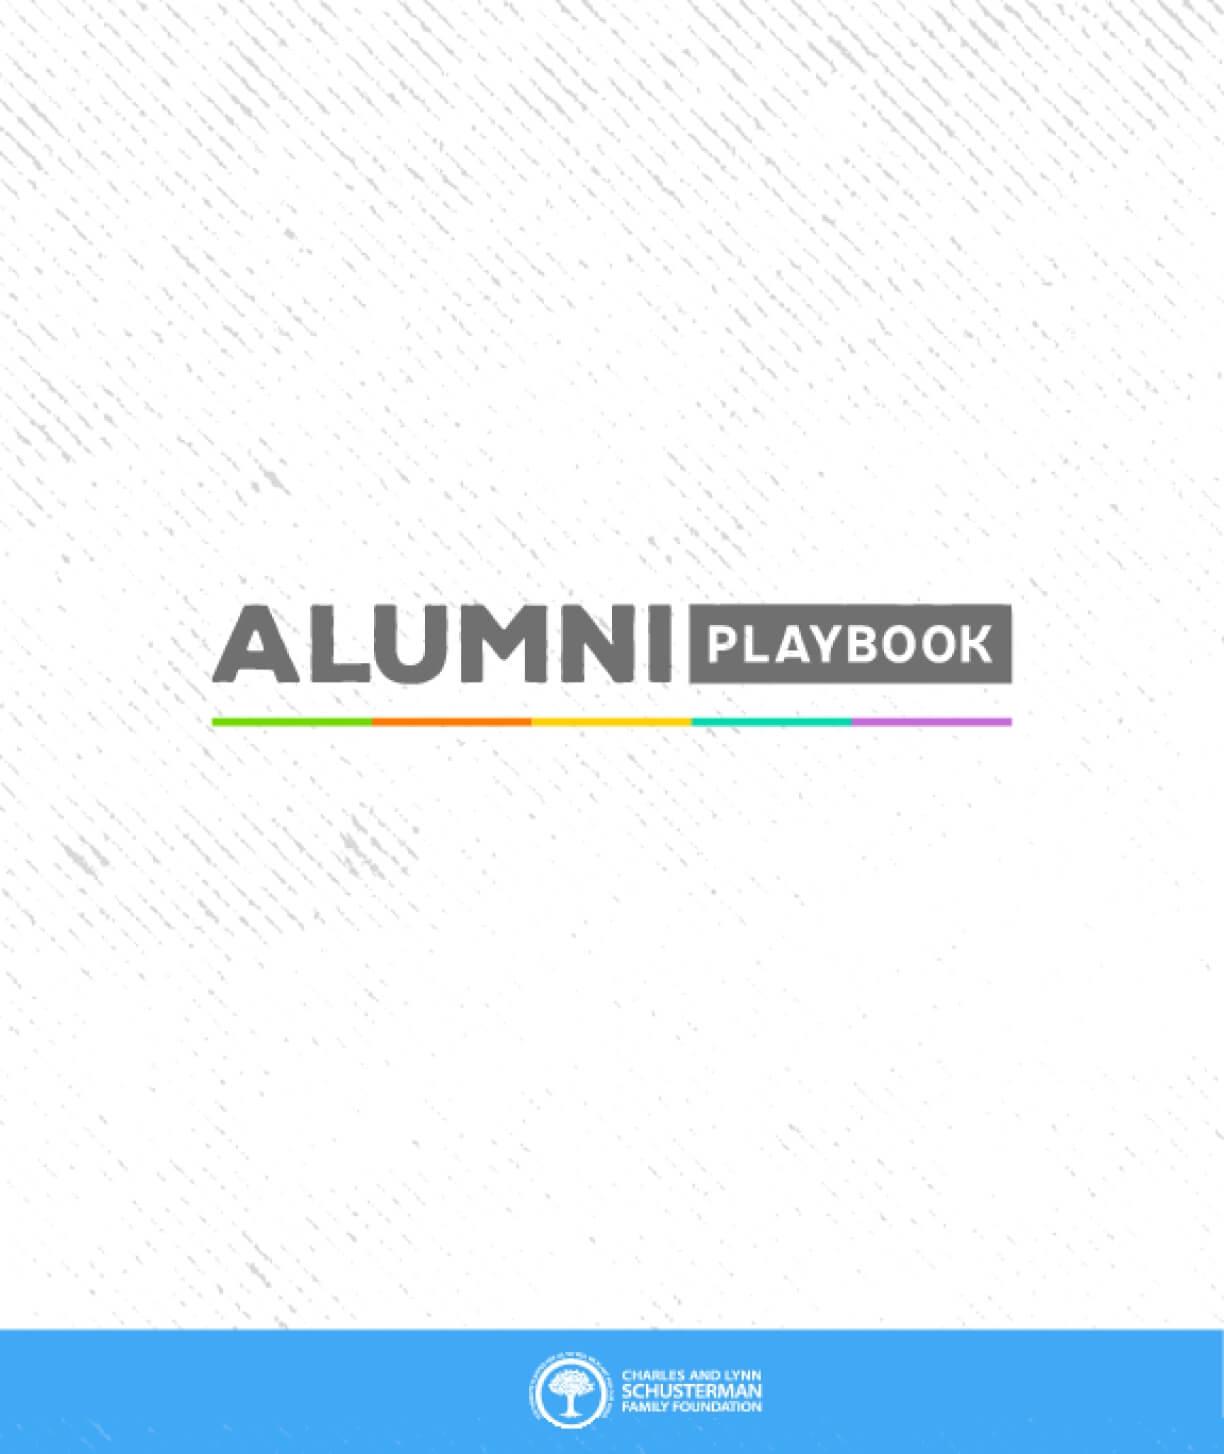 Alumni Playbook